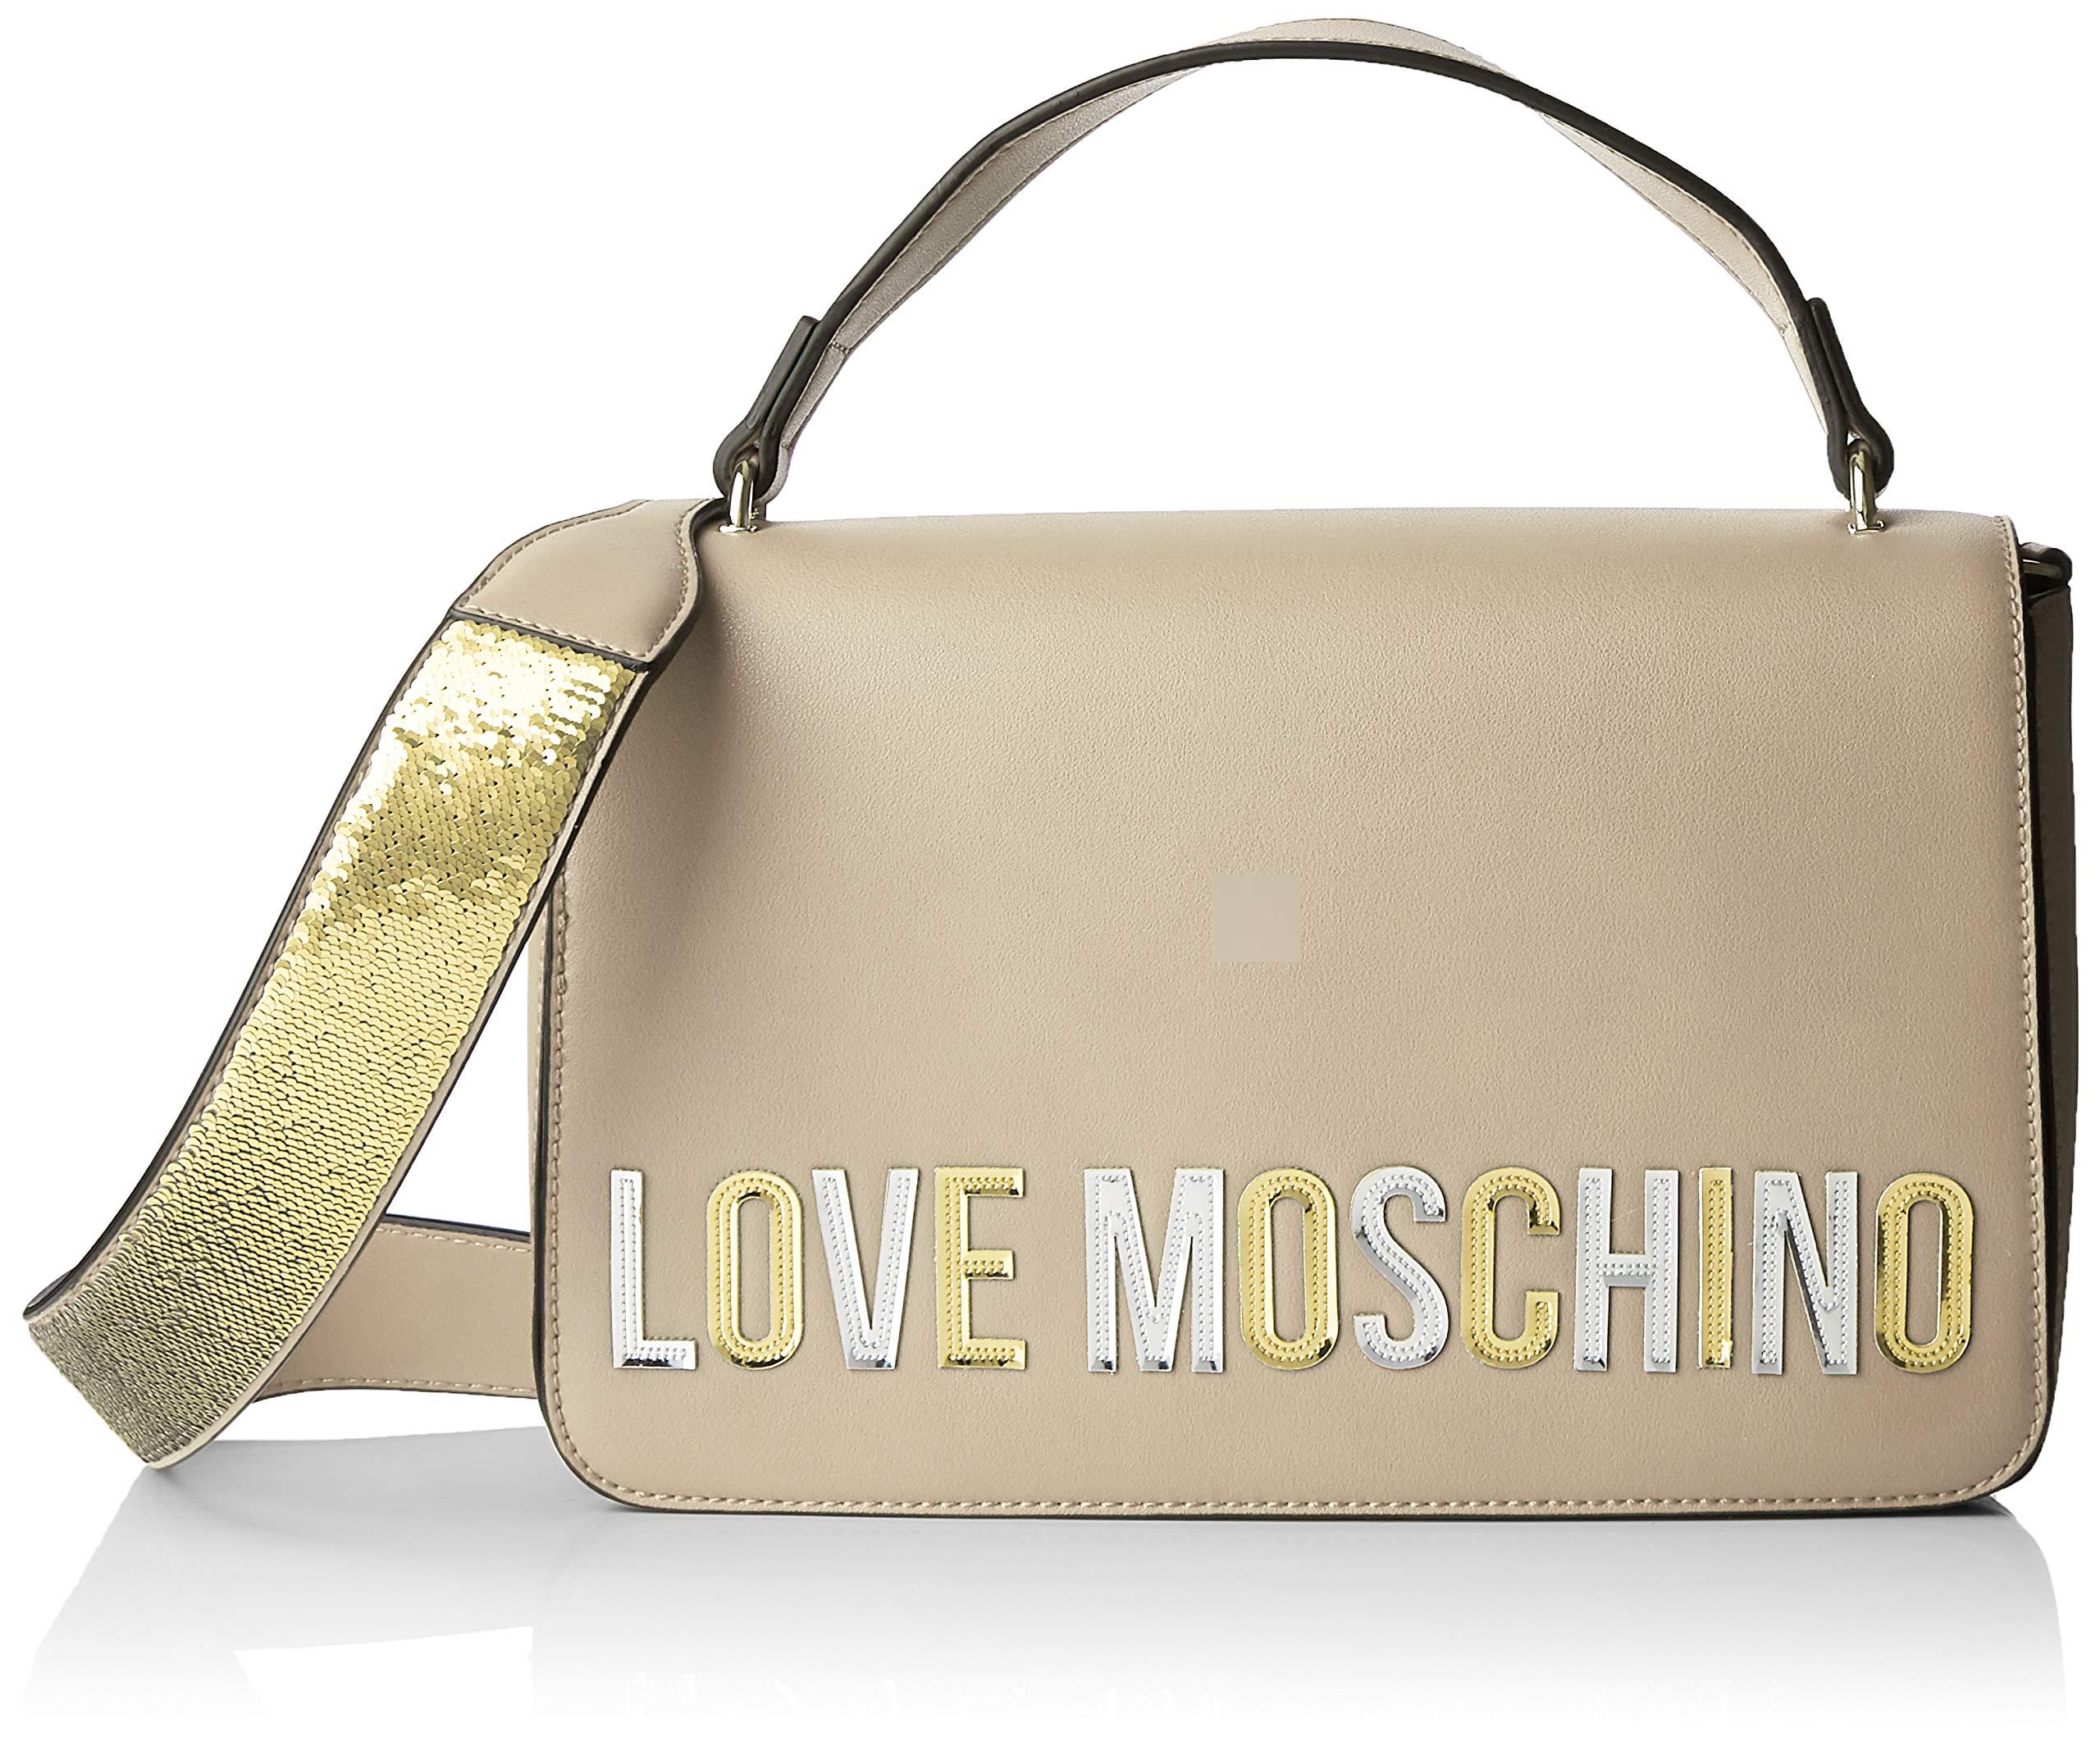 L Moschino Cmw Borsa Porté Love FemmeEcruavorio7x18x29 Main X PuSac H qVUMLpzSG